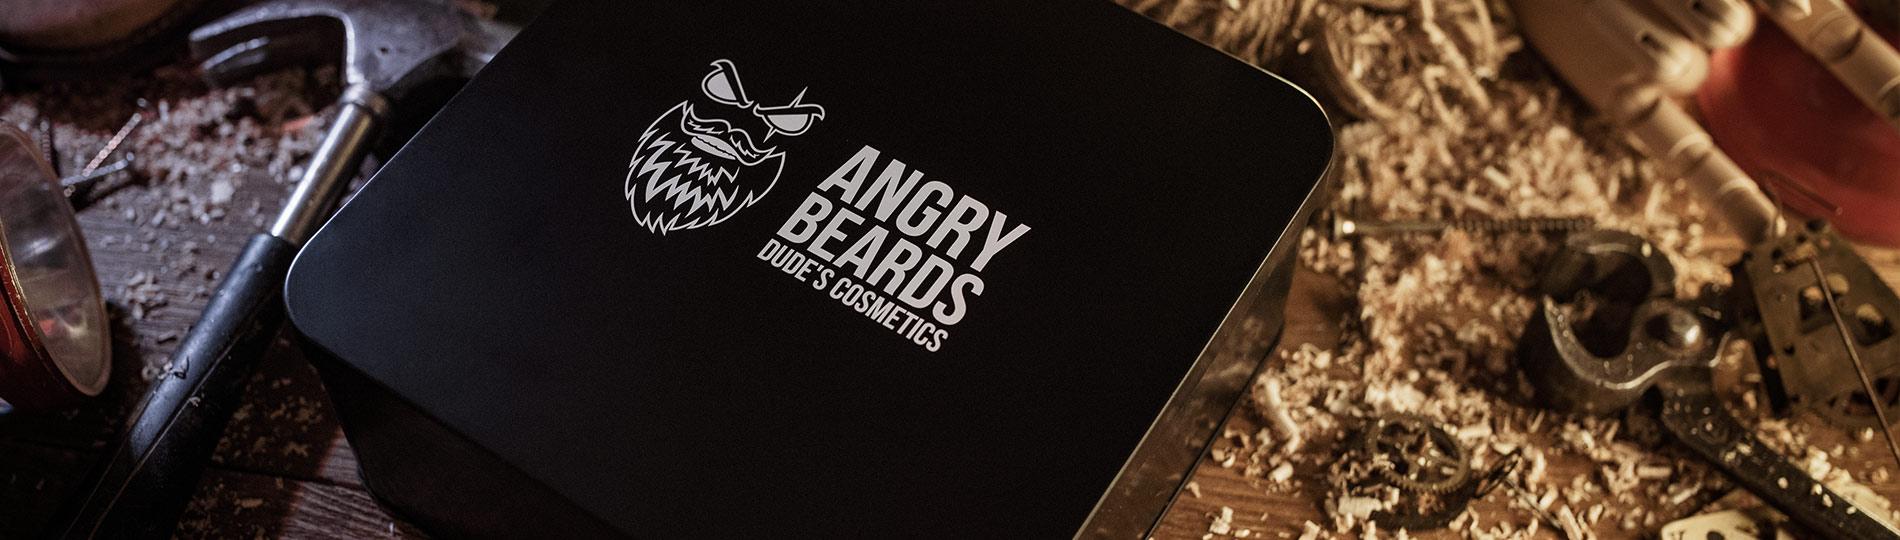 AngryBeardsSet2